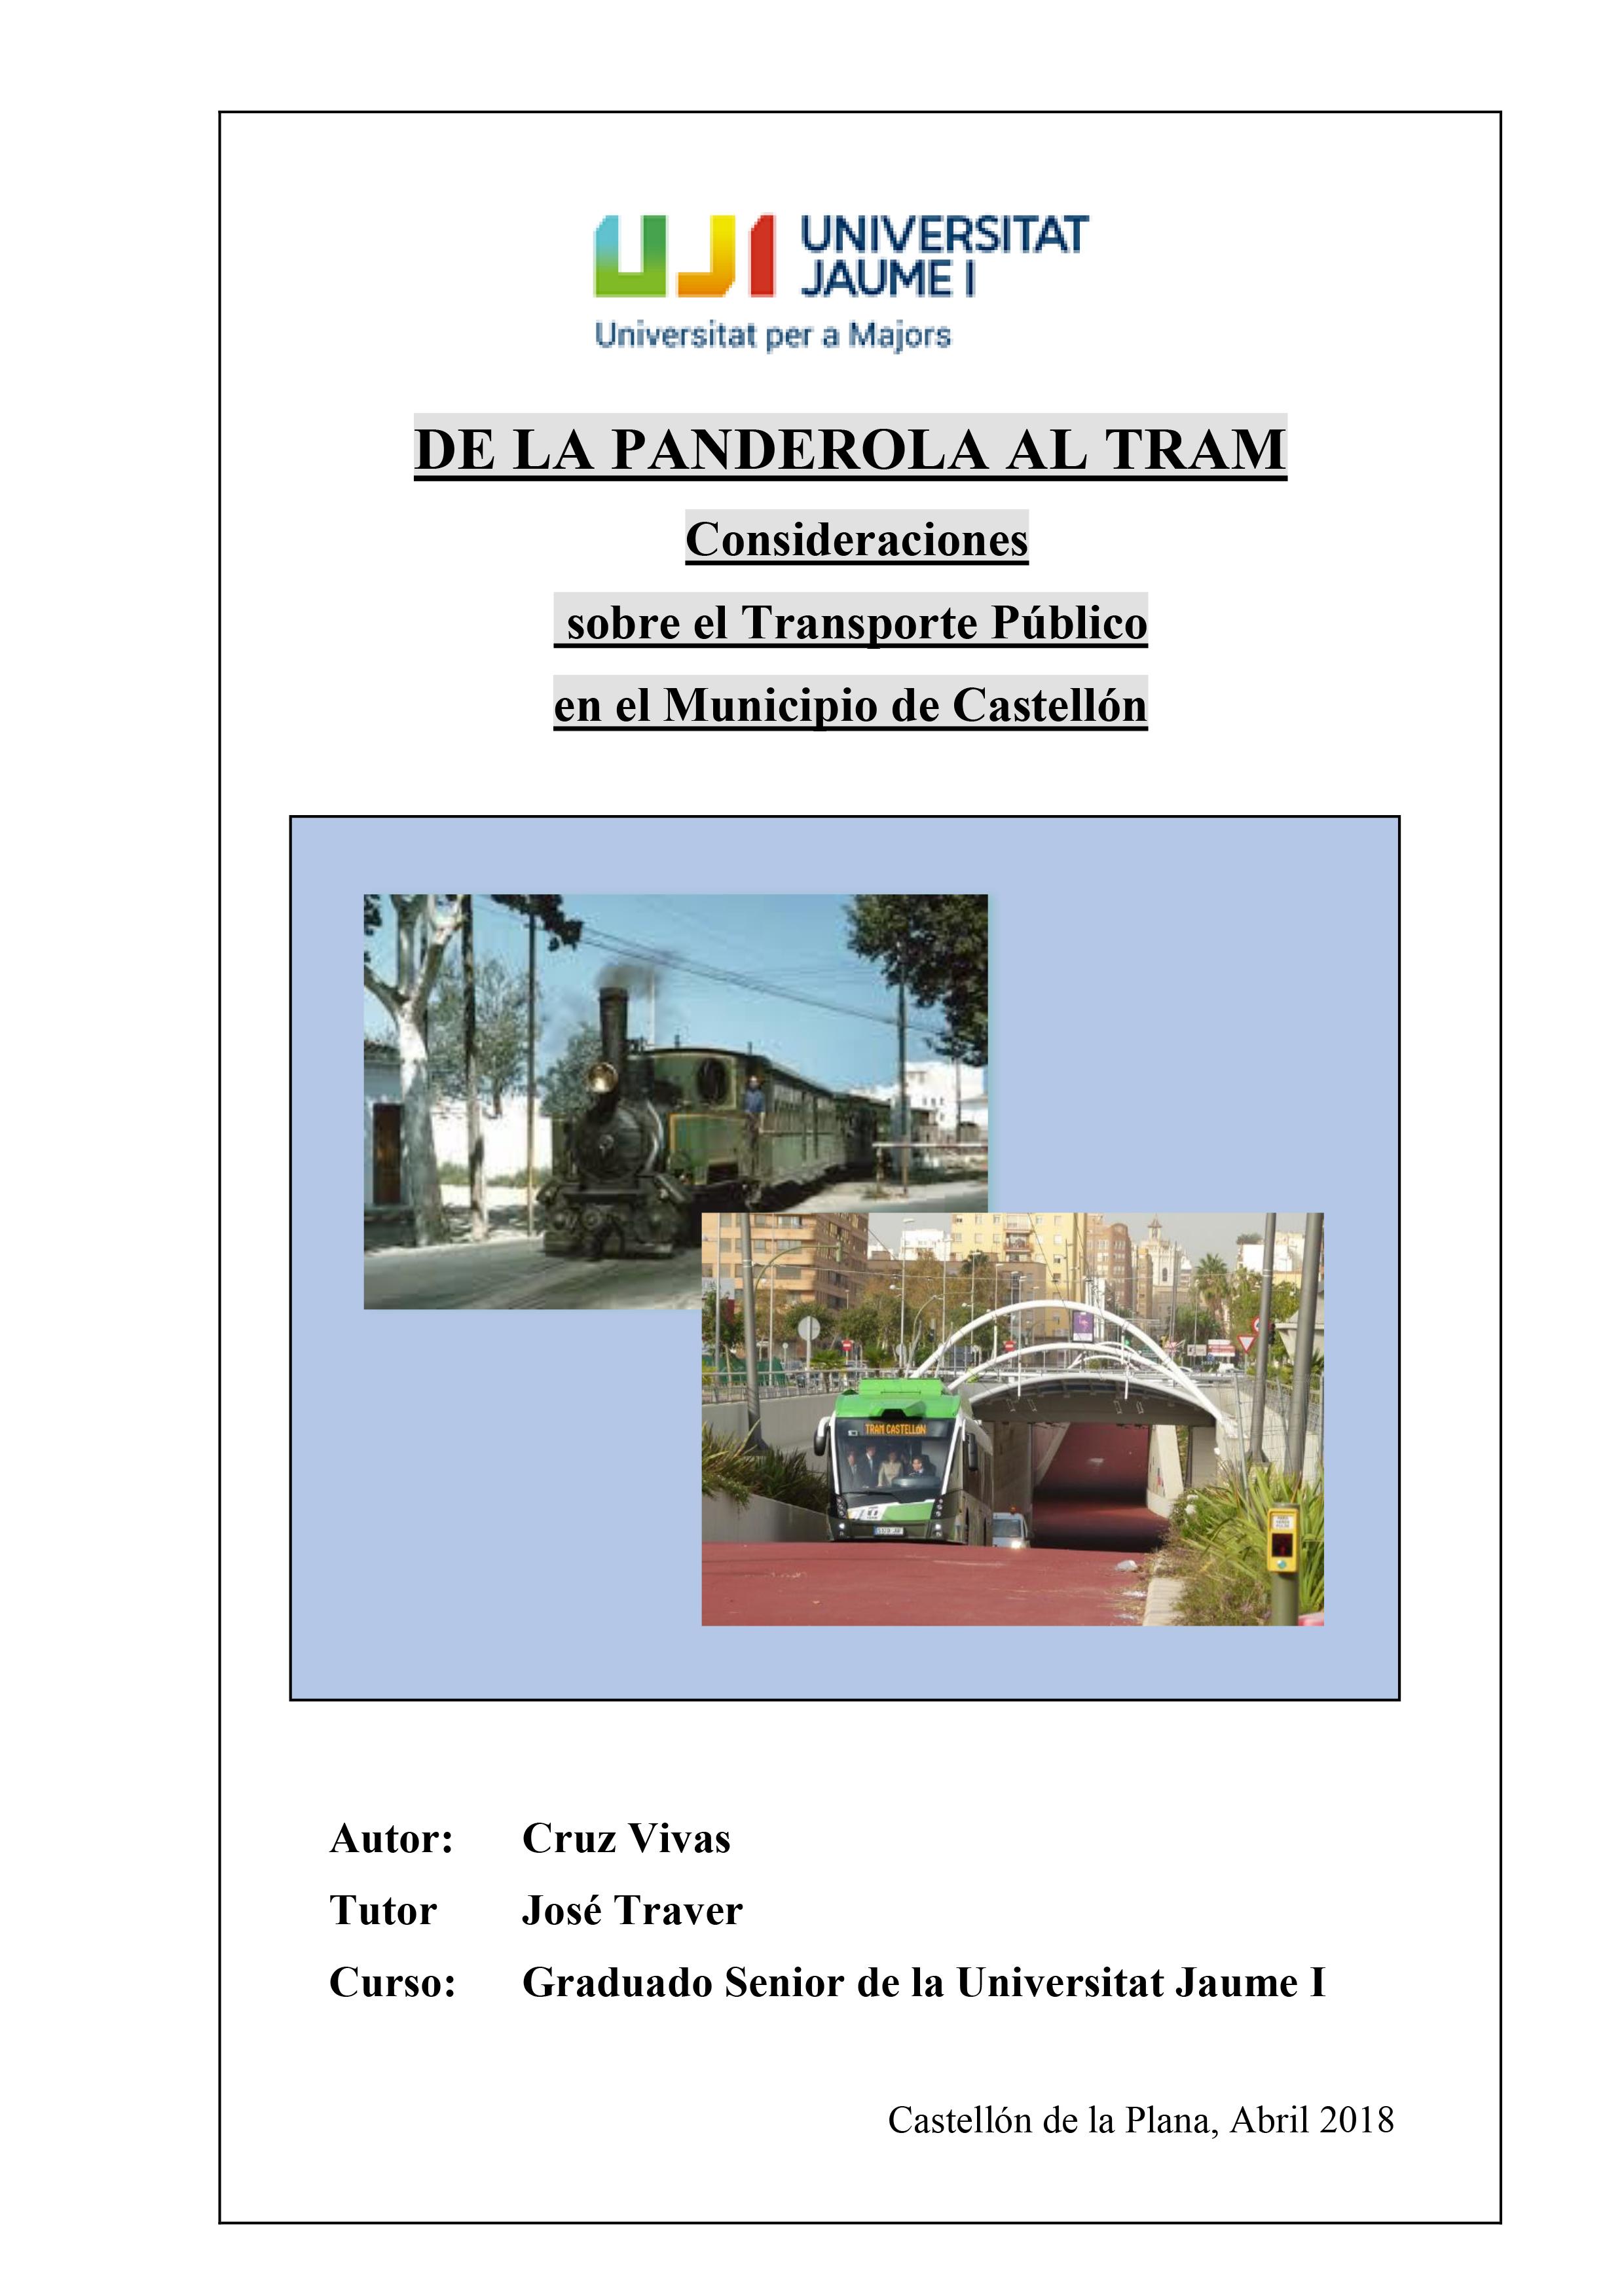 De-la-Panderola-al-Tram.